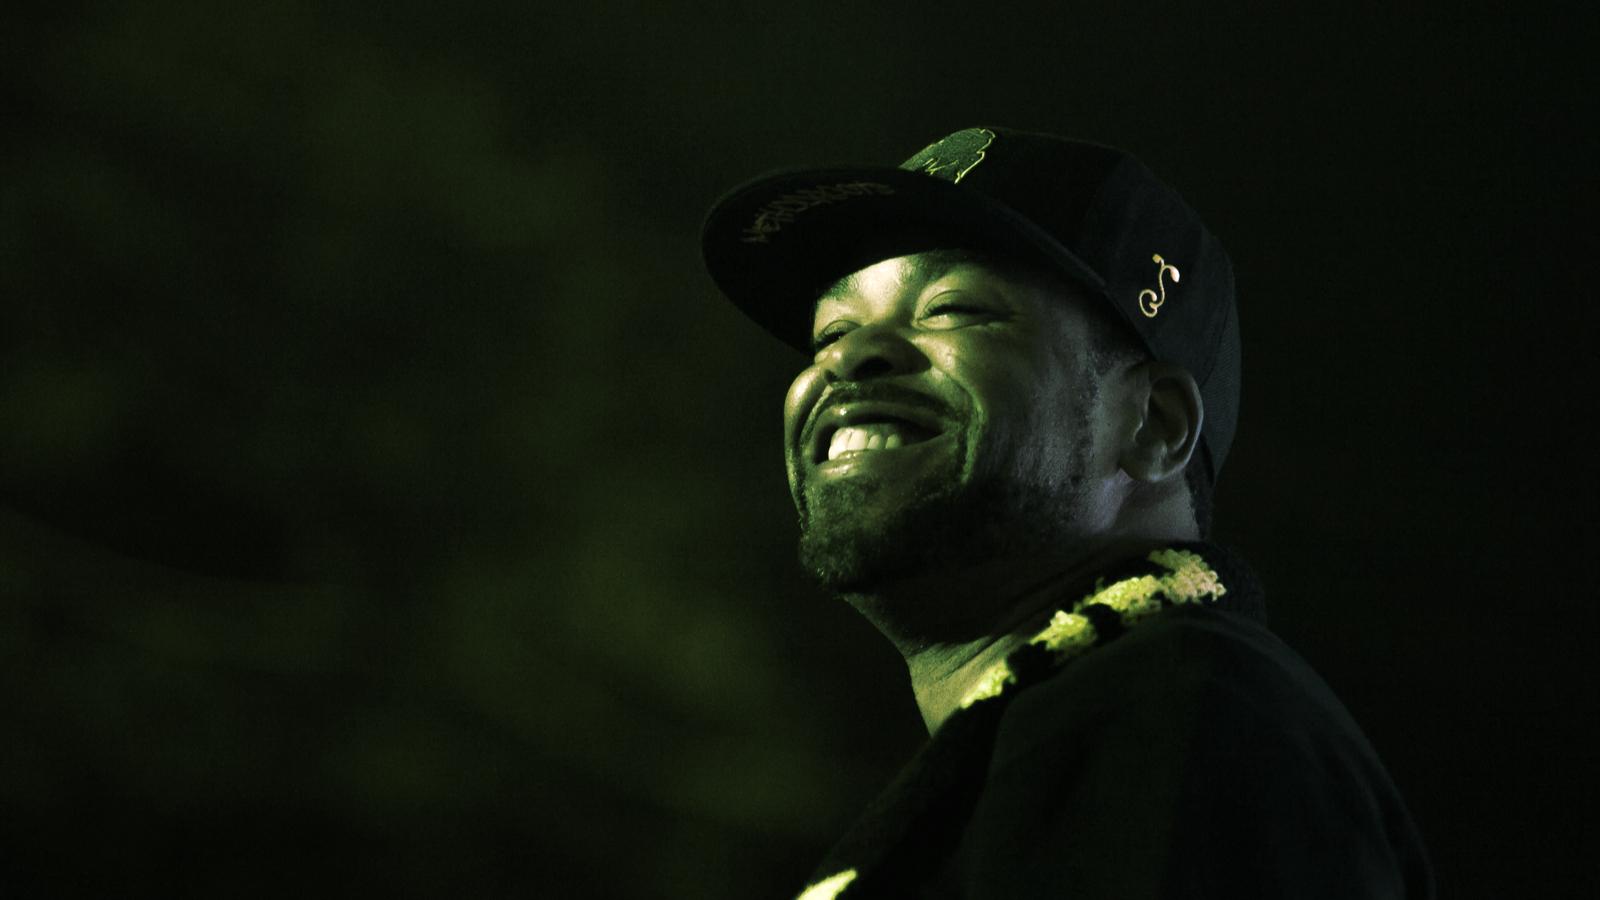 Wu-Tang Clan's Method Man to Launch NFT Comic Book Series